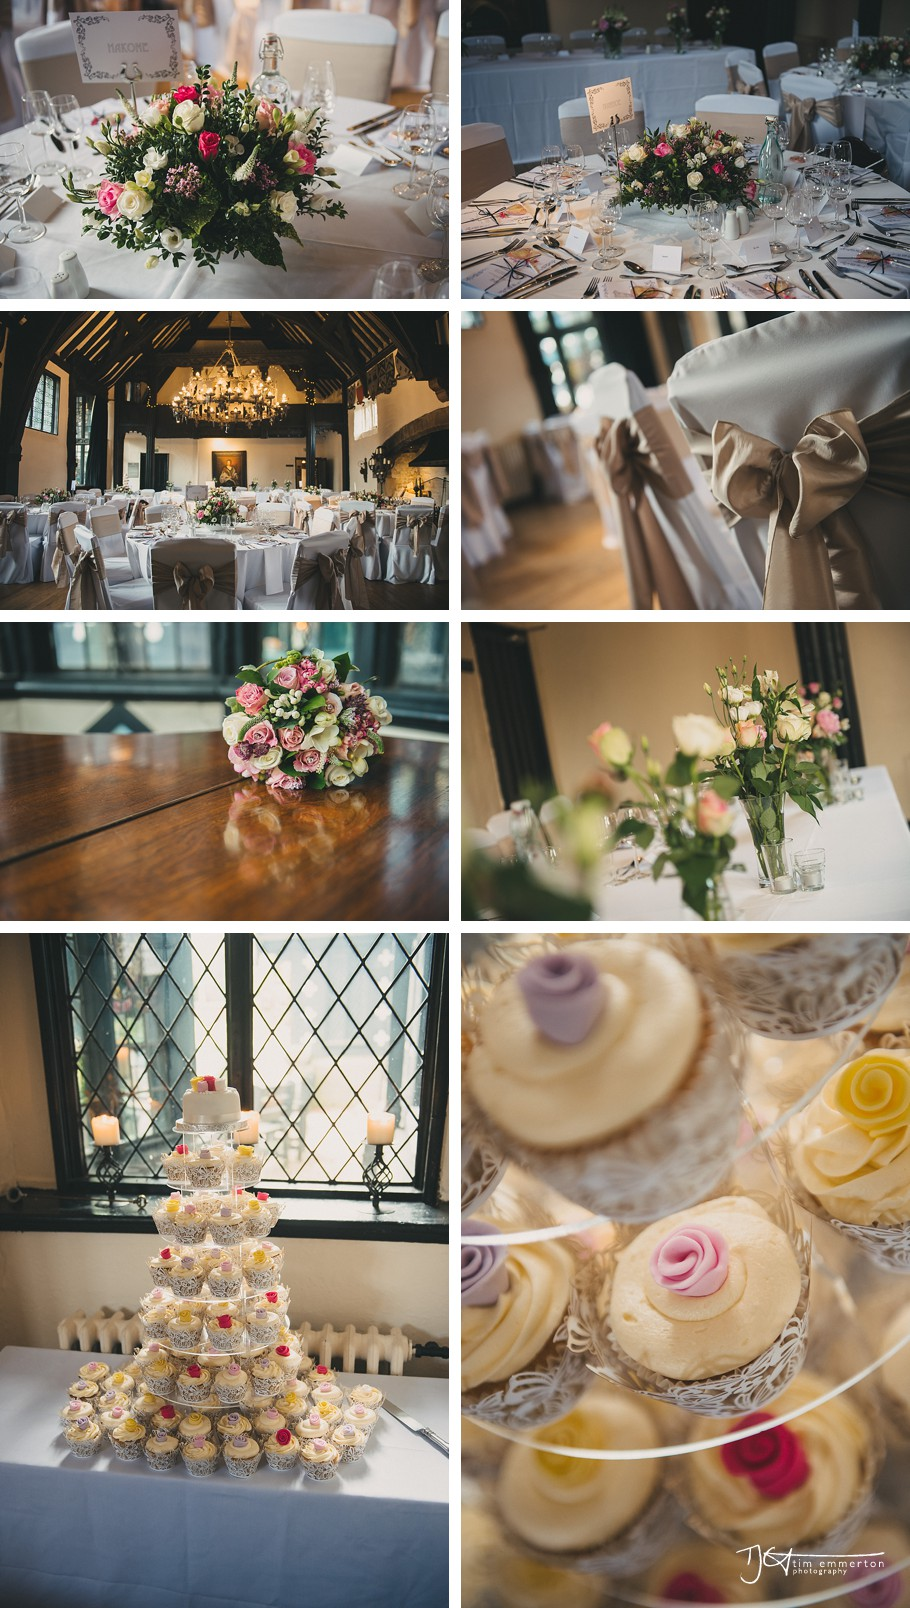 Samlesbury-Hall-Wedding-Photographer-148.jpg